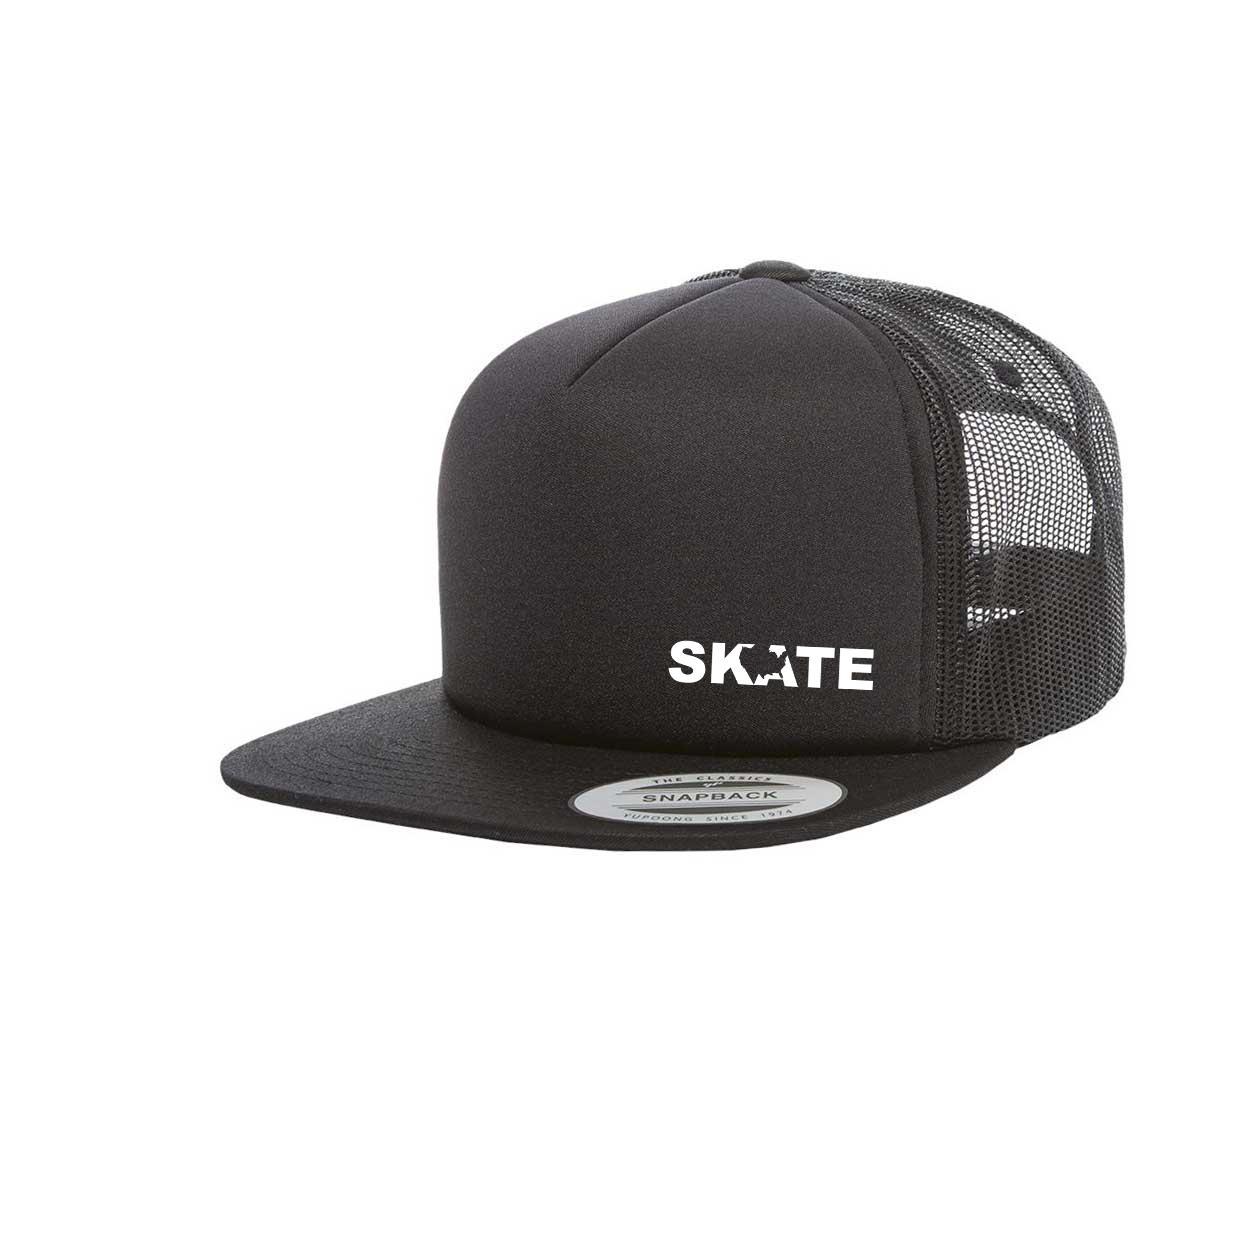 Skate United States Night Out Premium Foam Flat Brim Snapback Hat Black (White Logo)